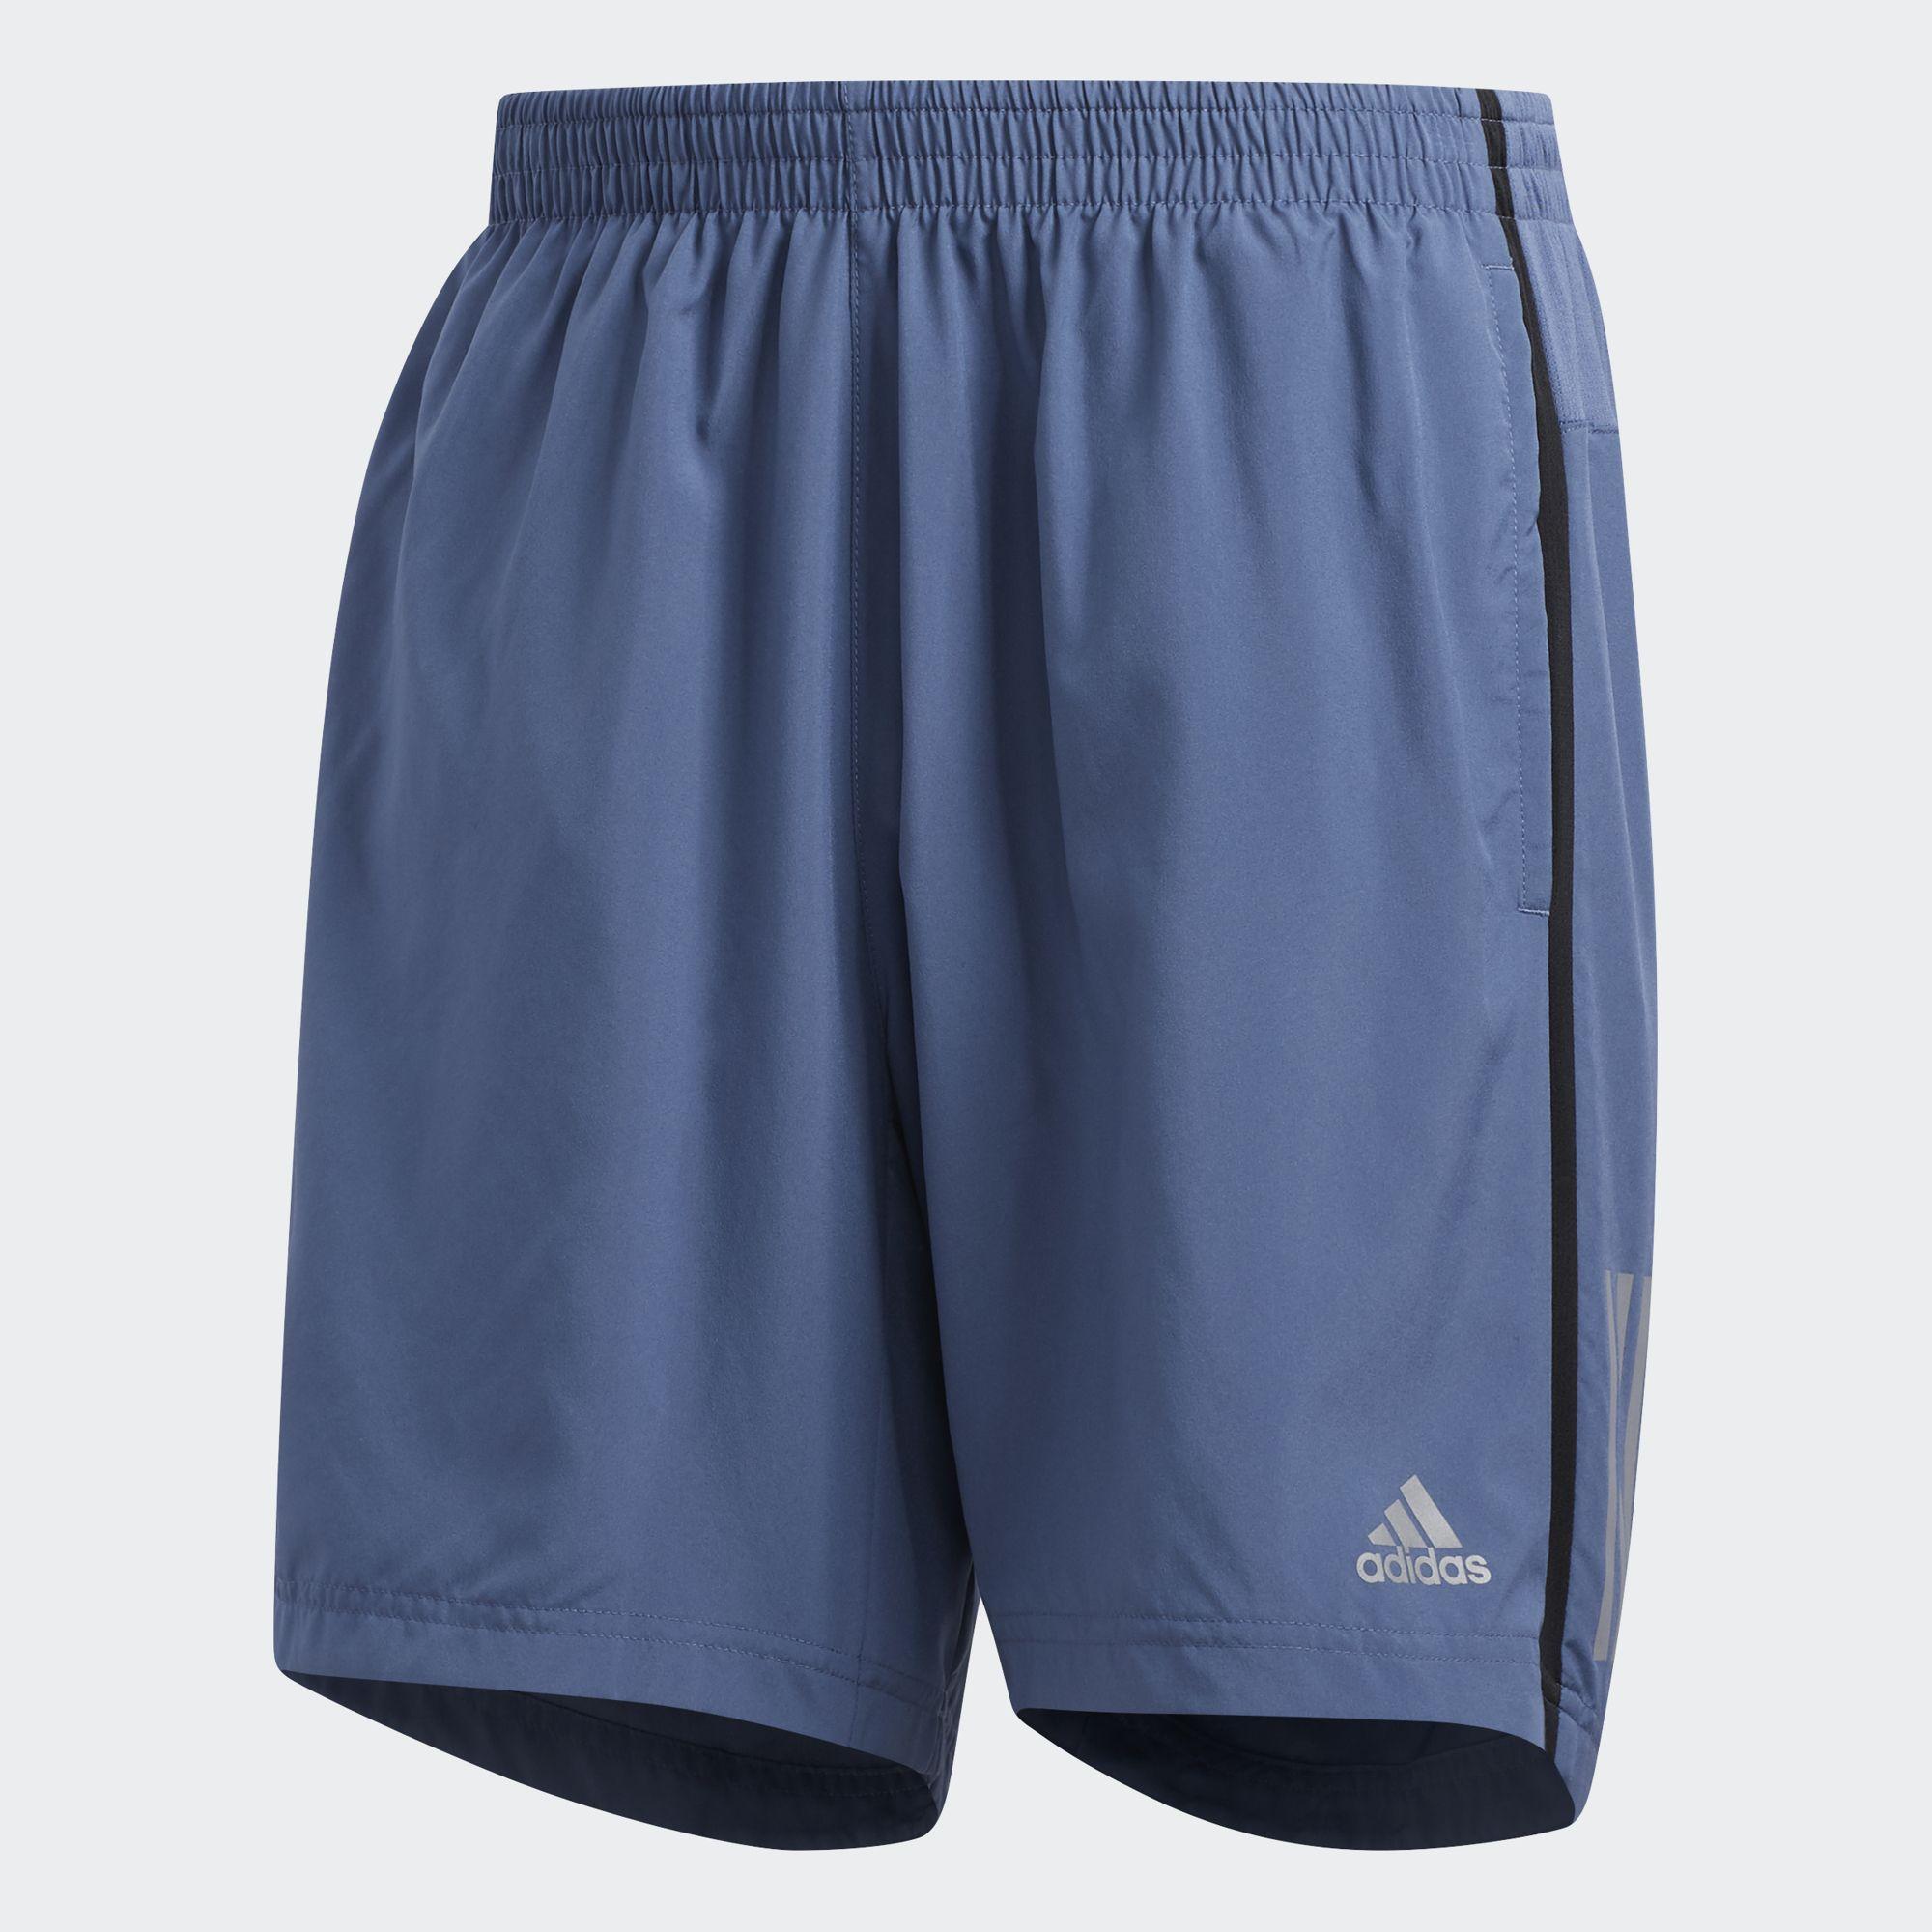 Jual Produk Adidas Terbaru   lazada.co.id